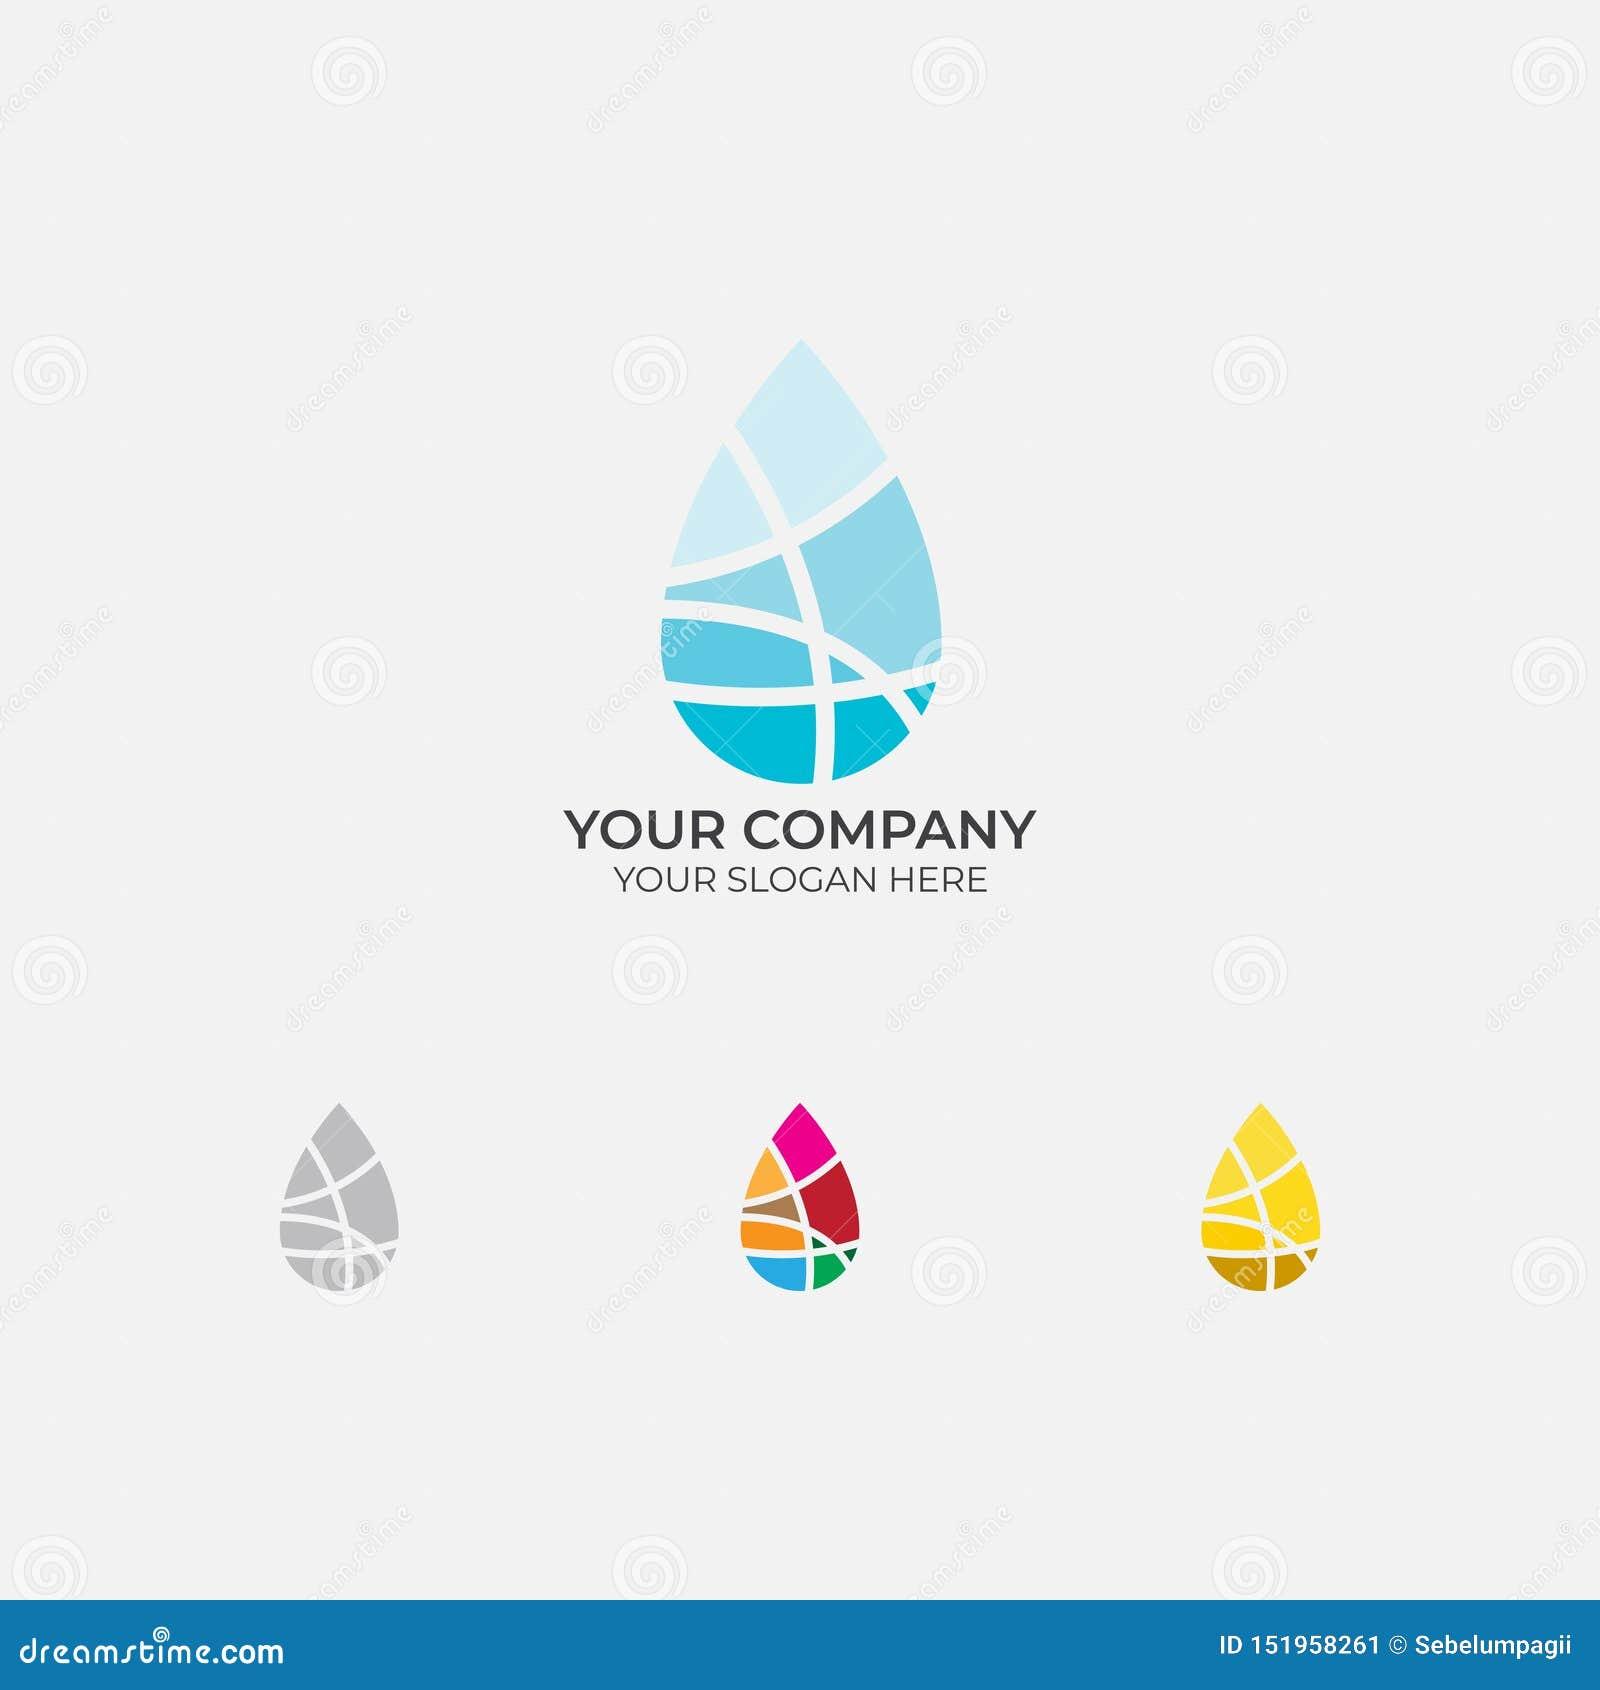 Water drop logo design